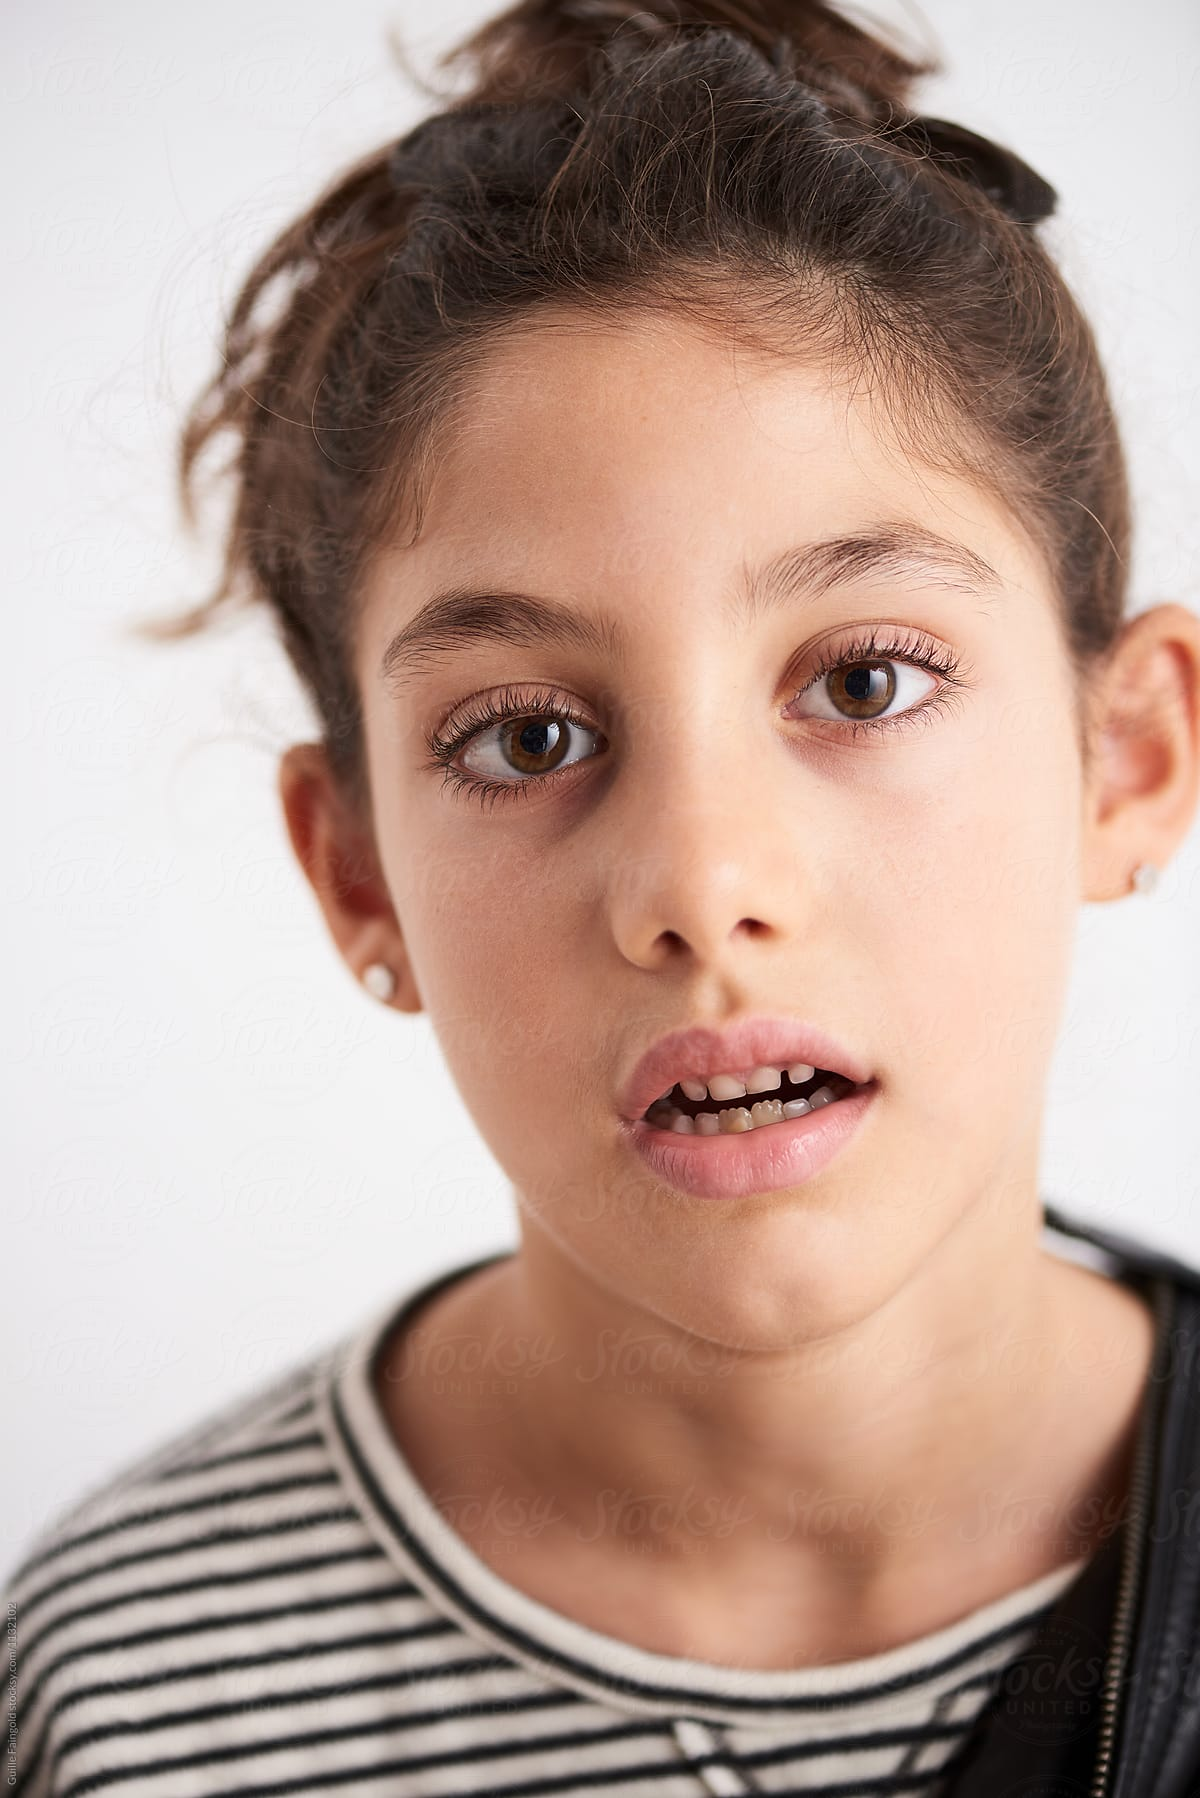 Girl open mouth teen Teen girl's